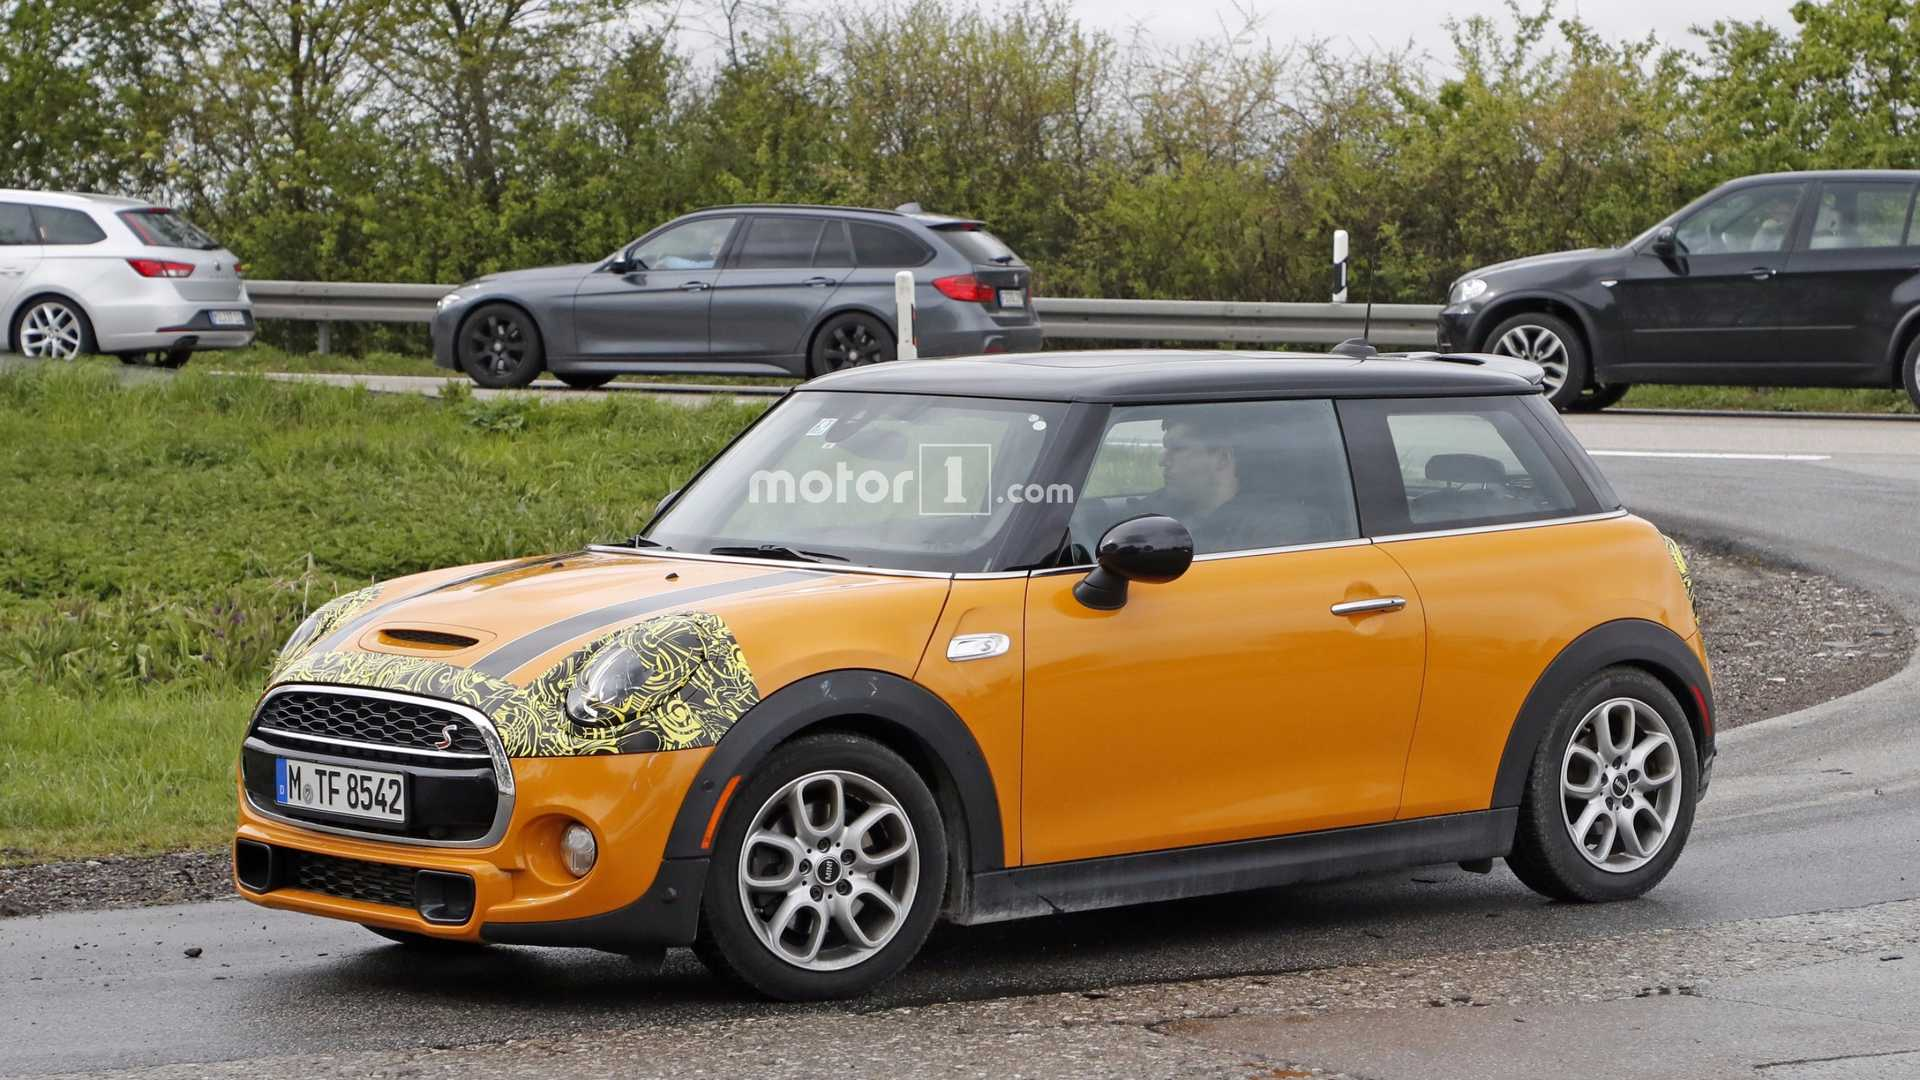 Spy Shots Show Mini Cooper Facelift 2015 Mini Cooper Forum